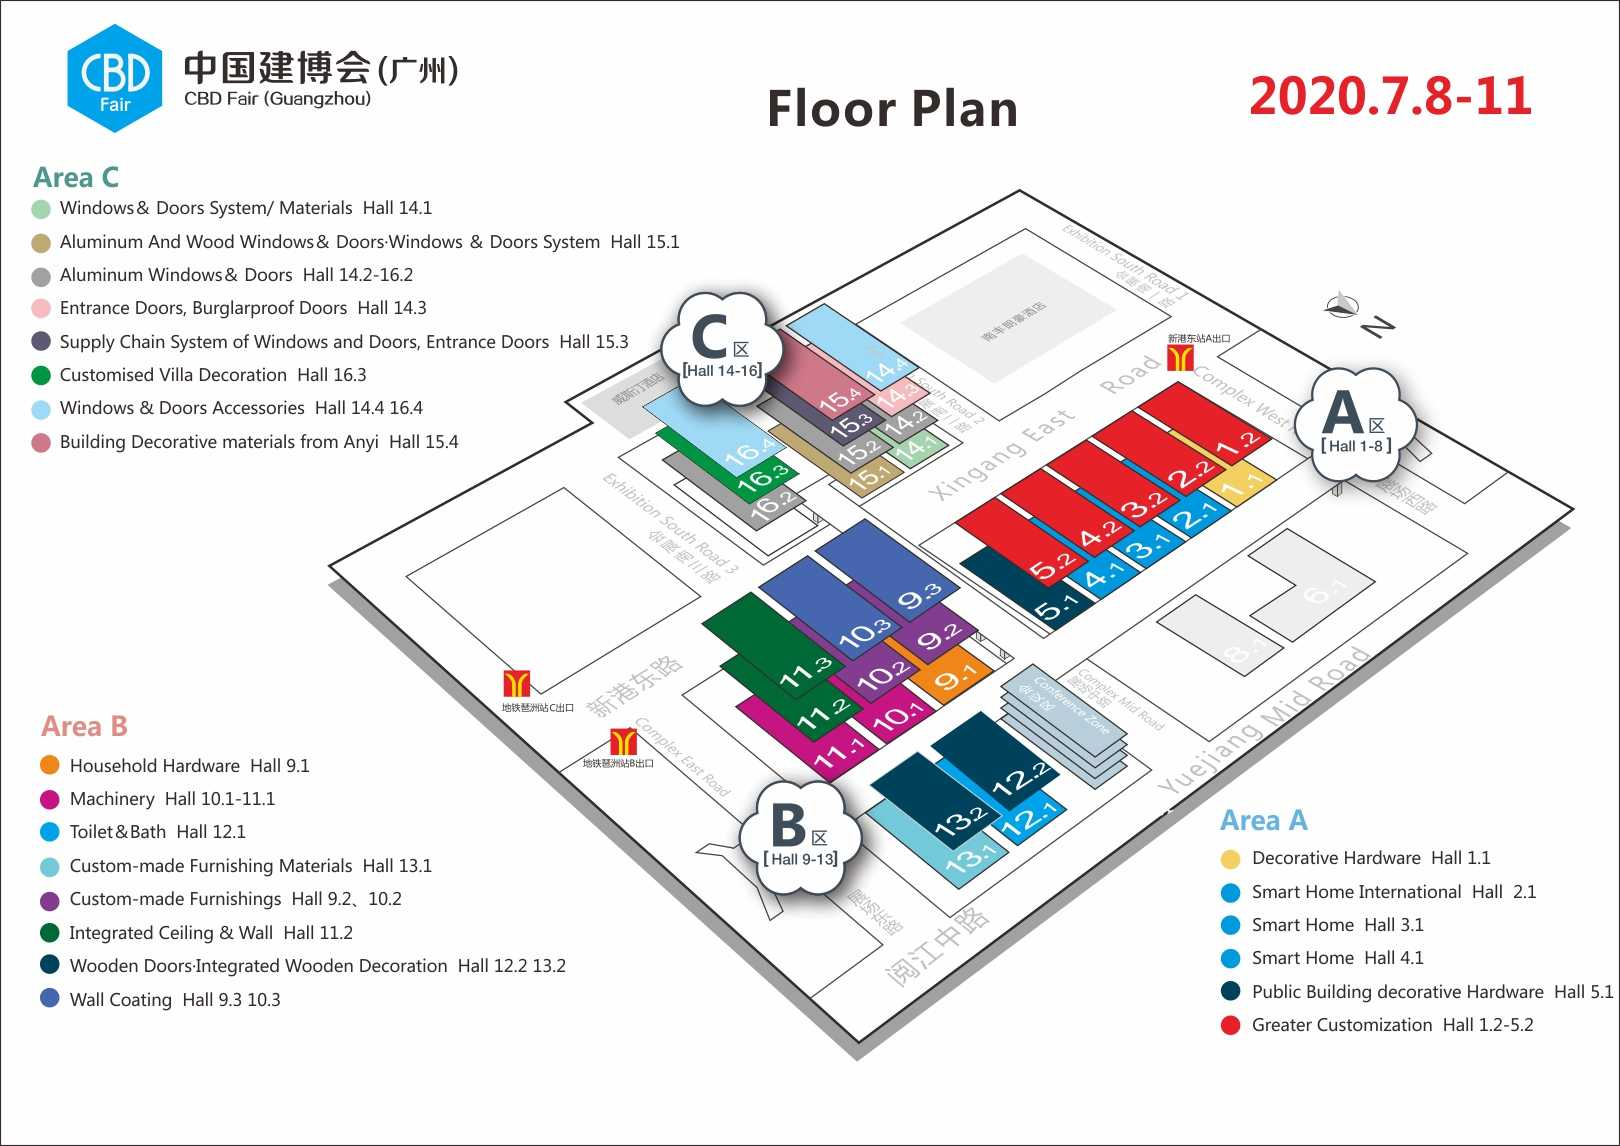 CBD Fair Floor Plan